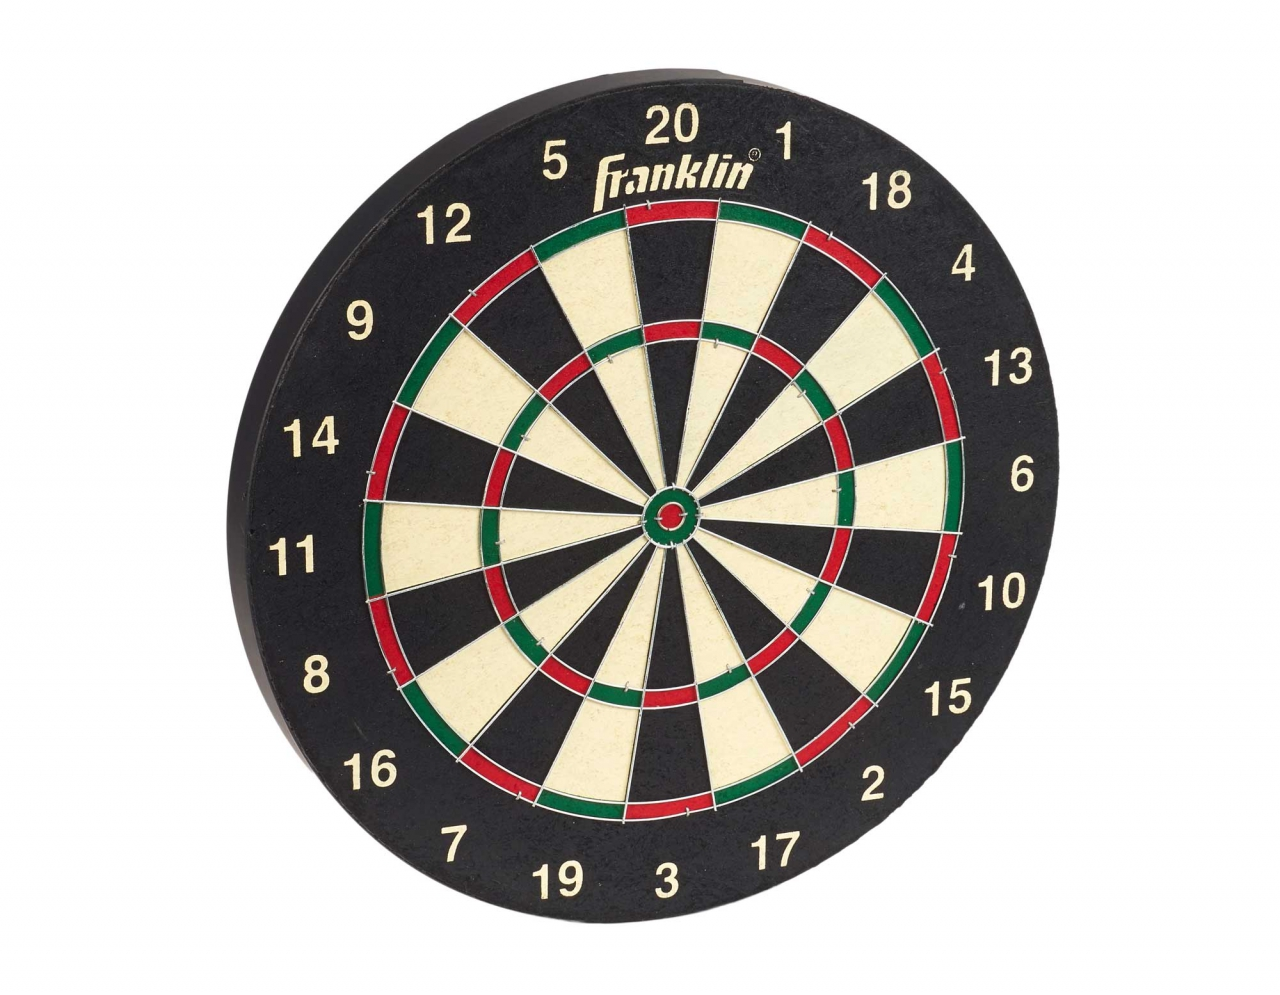 Franklin Pro Wire Bristle Dartboard, Sport, play, recreation, Darts, Dartboard